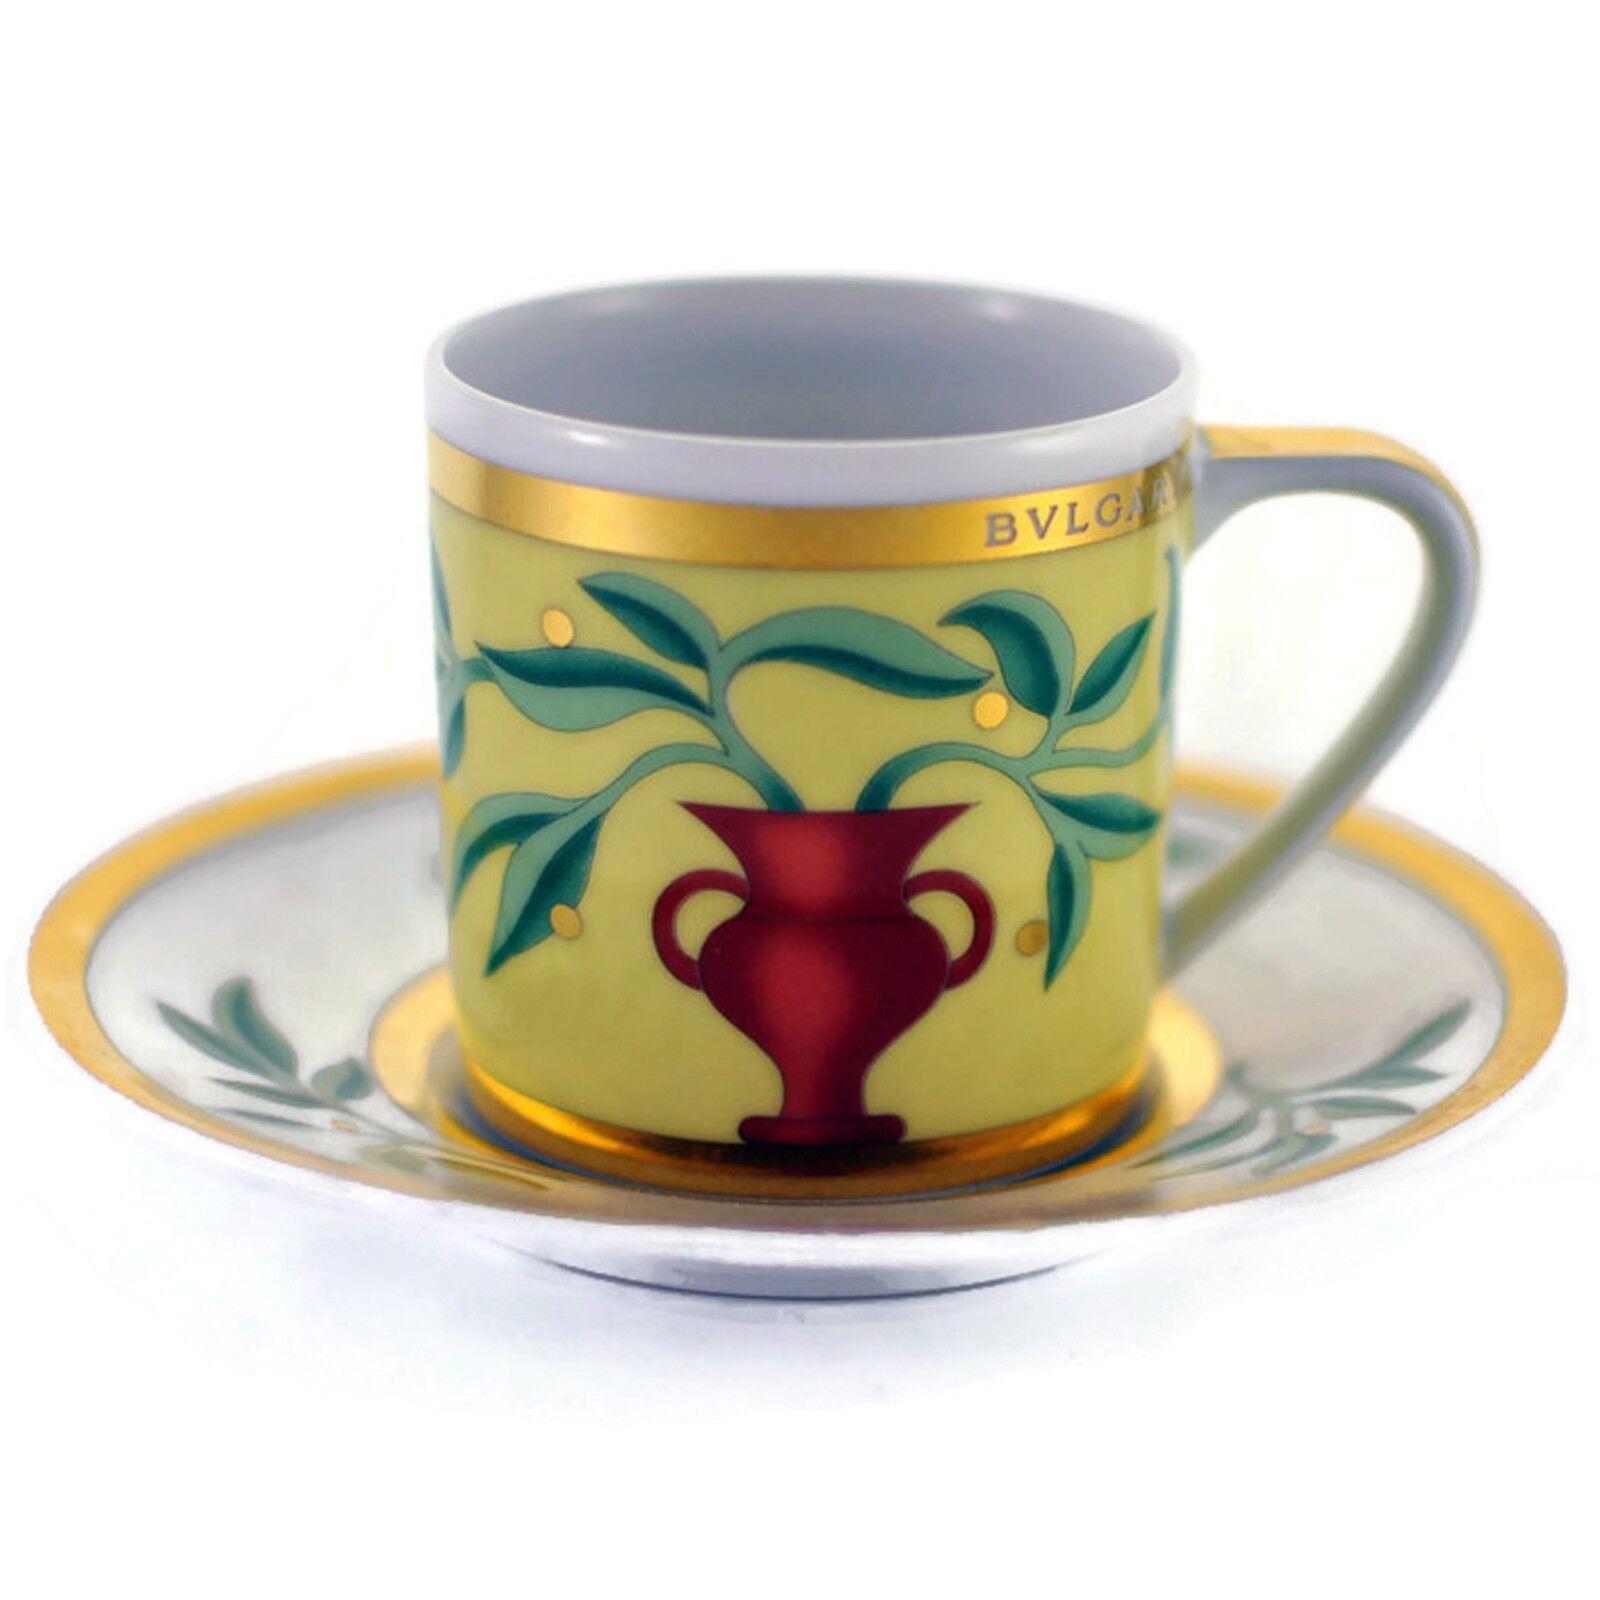 Bulgari Rosenthal Porcelain-Itaca Espresso Tasse & Soucoupe